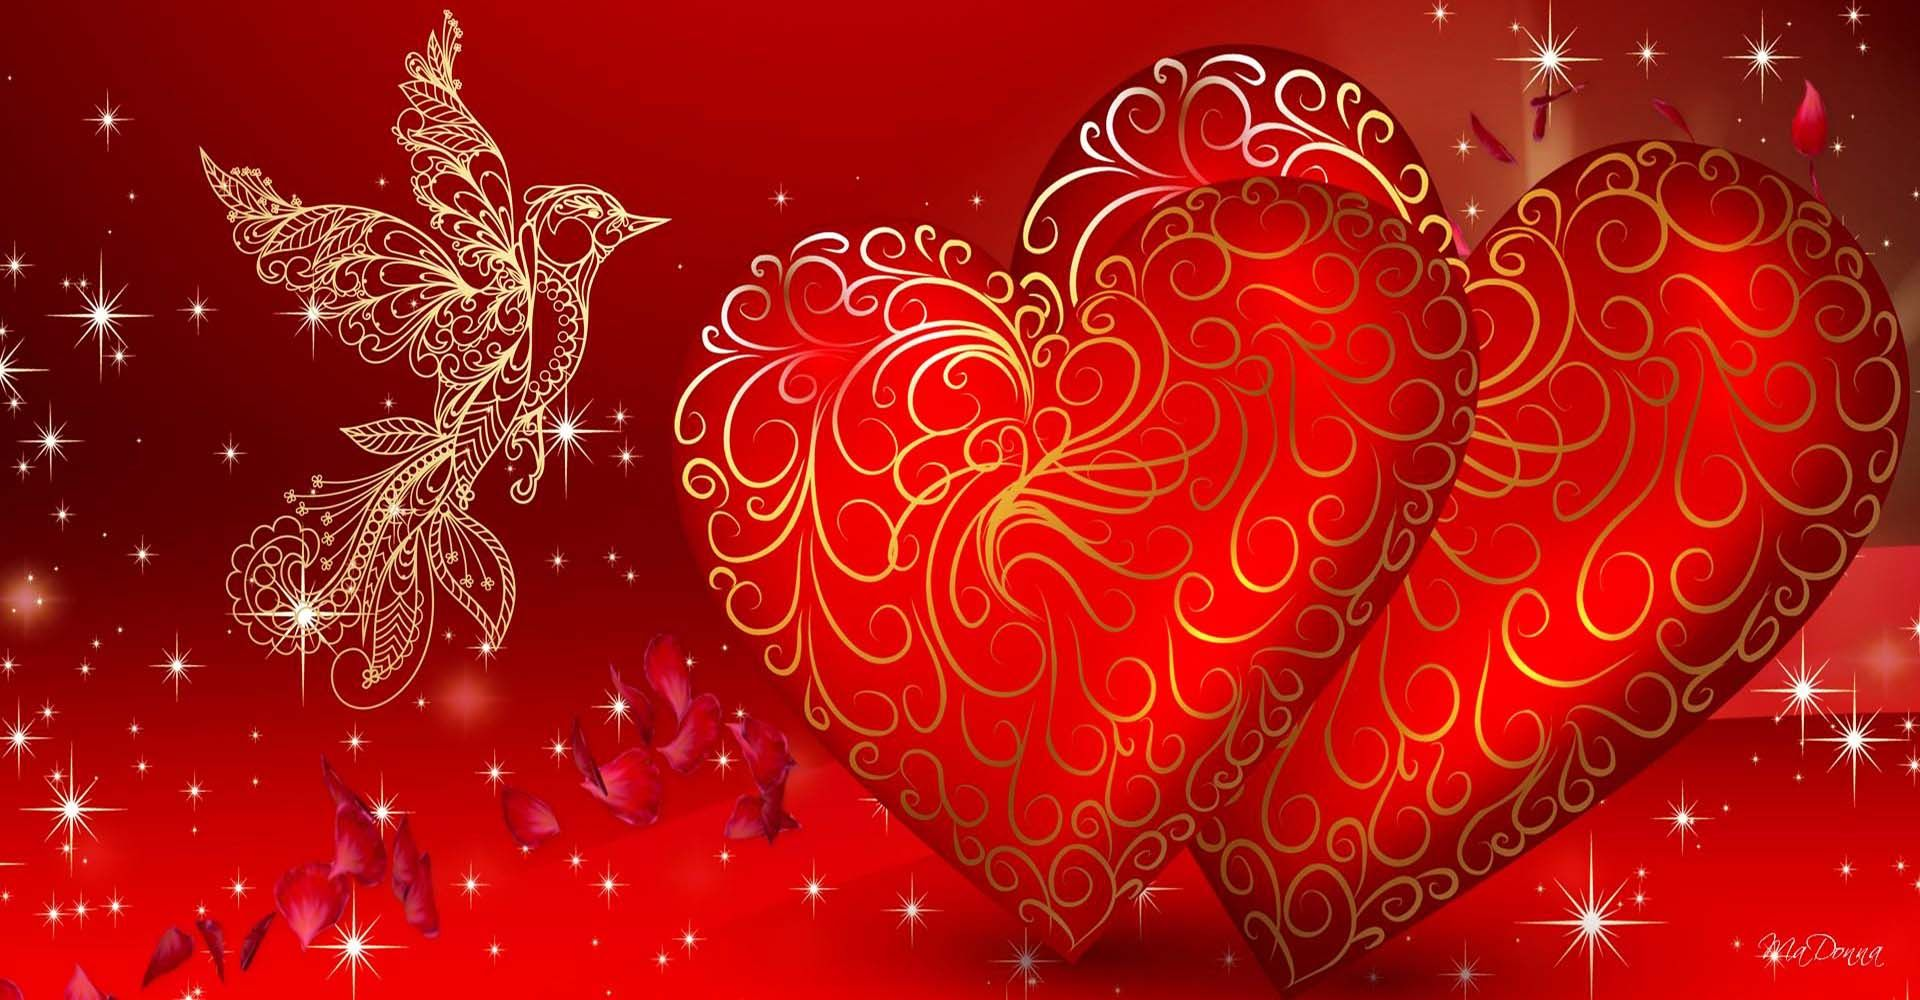 hearts wallpaper images eun awesomeness love heart. Black Bedroom Furniture Sets. Home Design Ideas